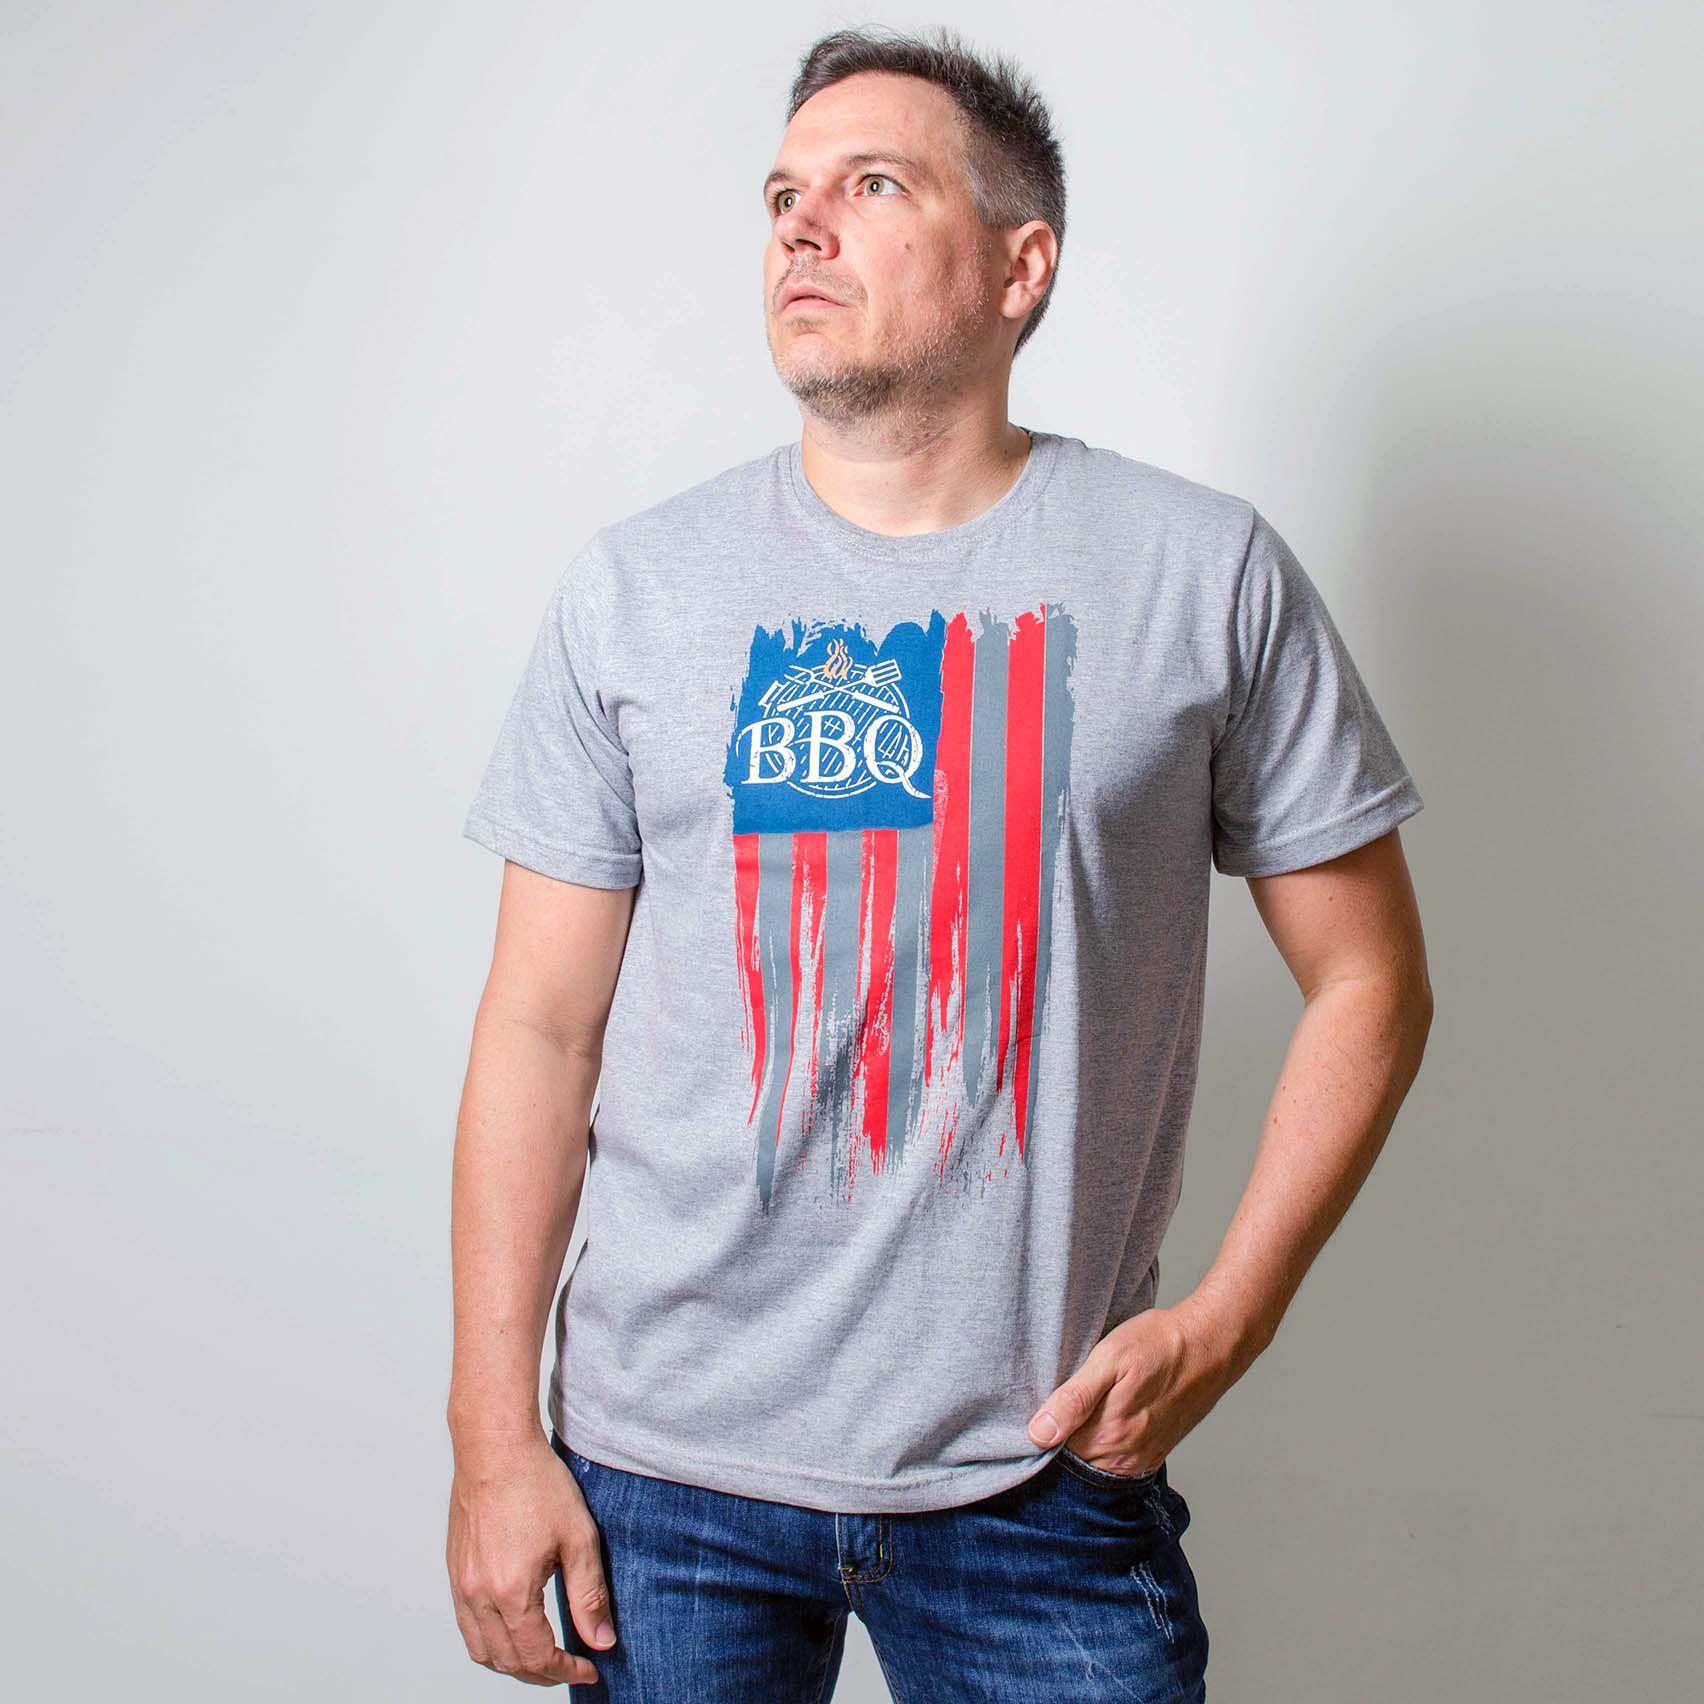 Camiseta Masculina Estampada BBQ  USA Cinza